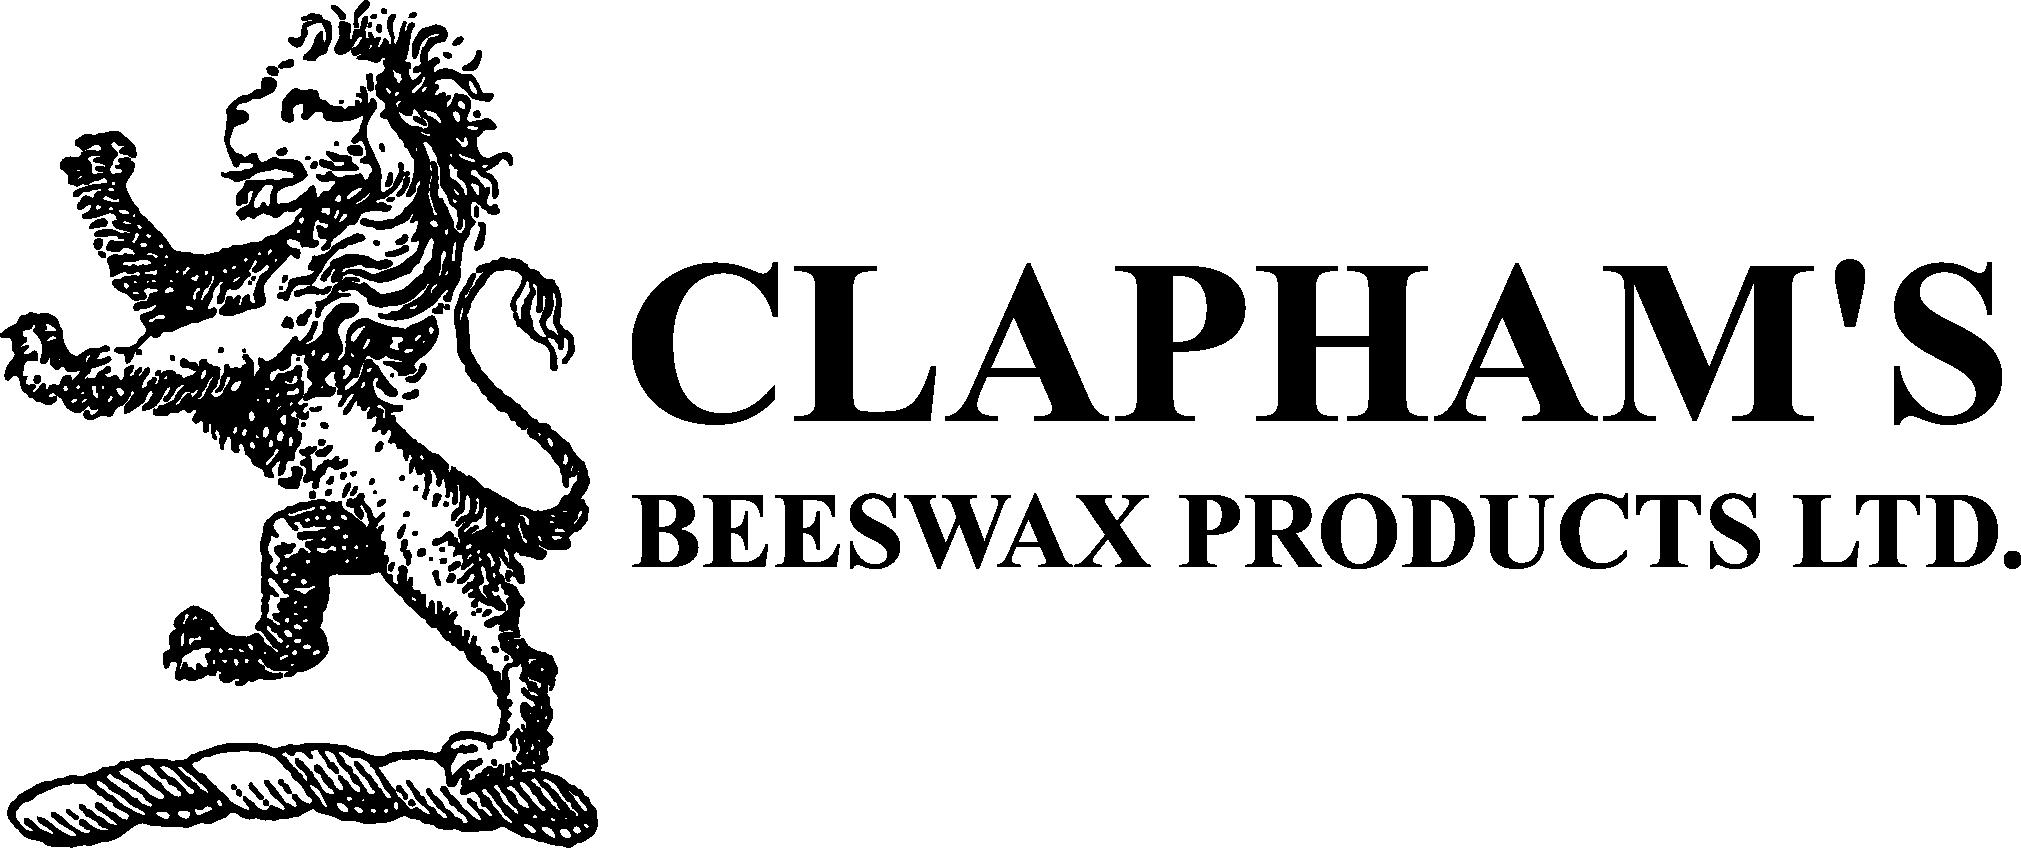 Clapham's Retina Logo